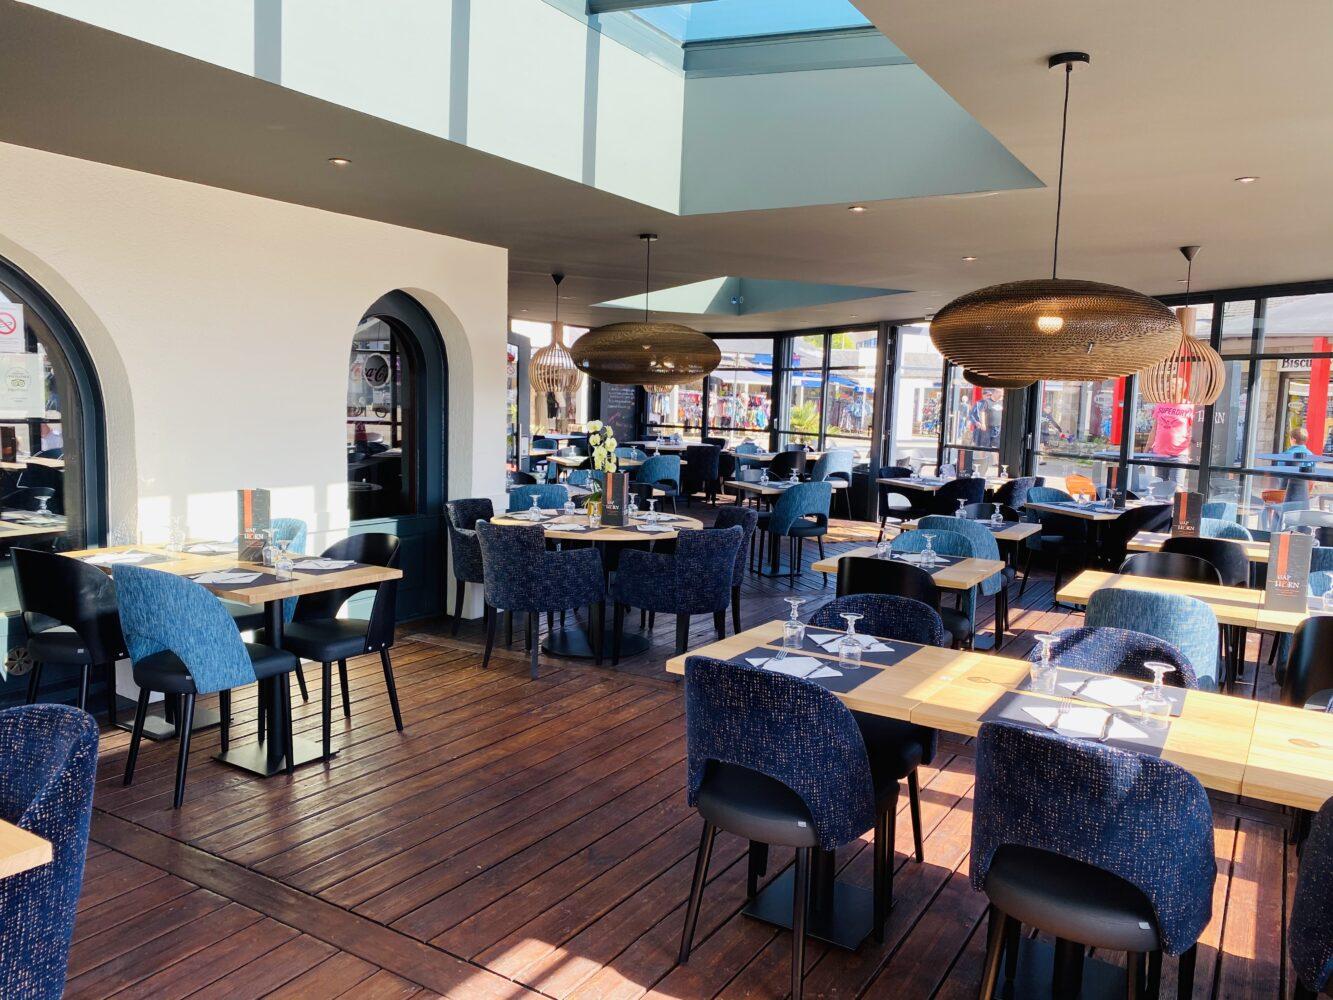 Restaurant-Le-Cap-Horn-interieur-restaurant-2